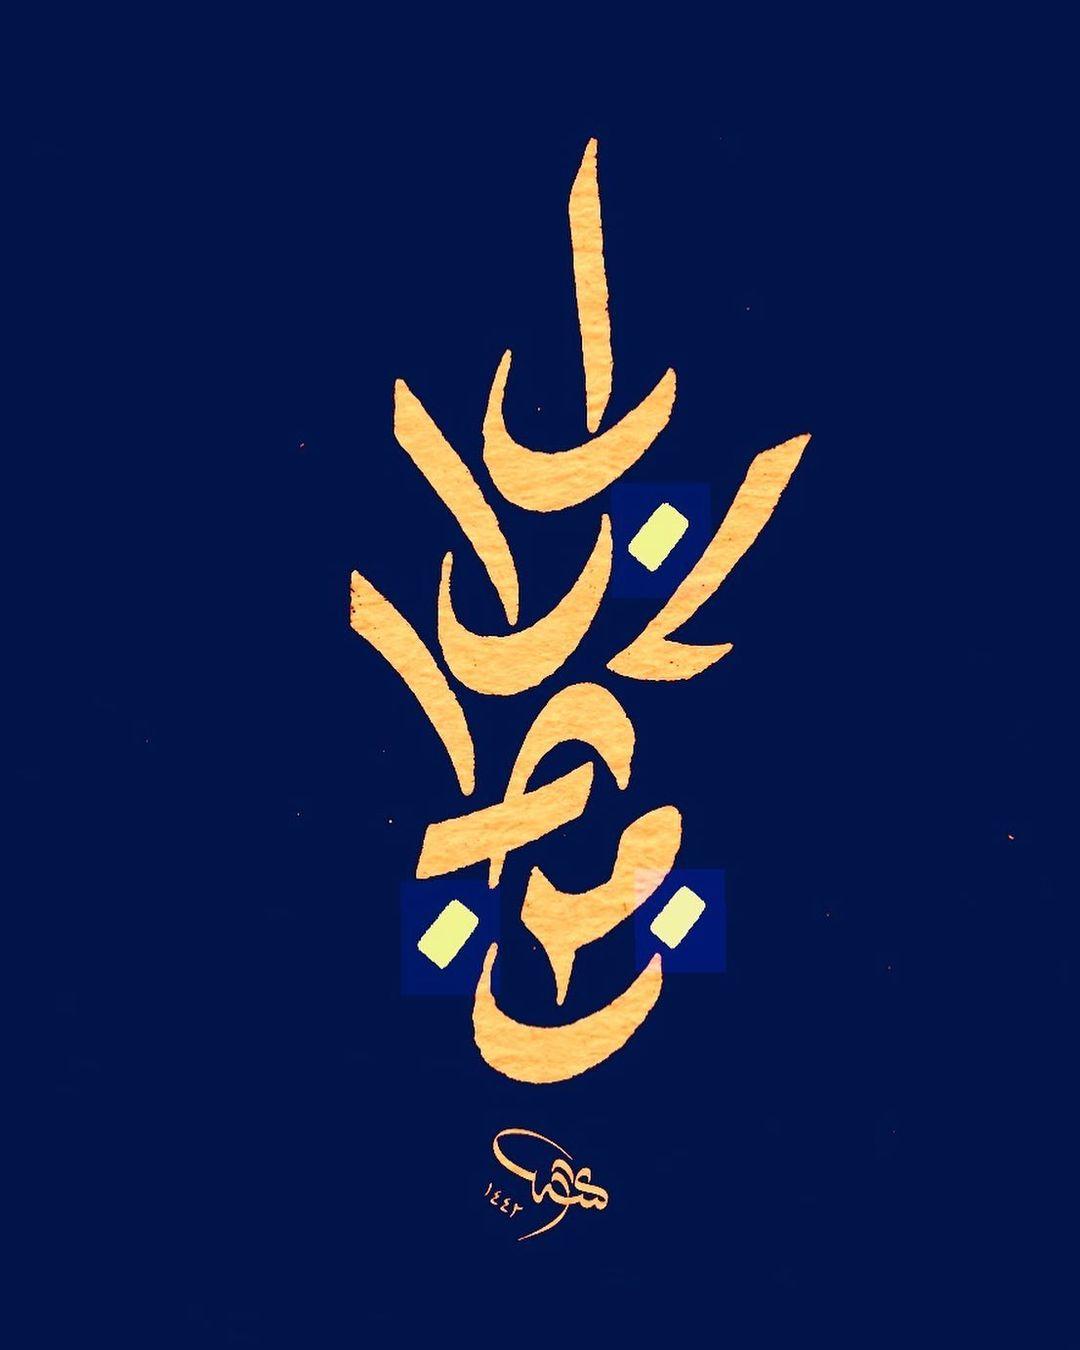 Donwload Photo Men câle nâle, kim ararsa ulaşır. من جال نال #arabiccalligraphy #islamiccalligra...- hattat_aa 1